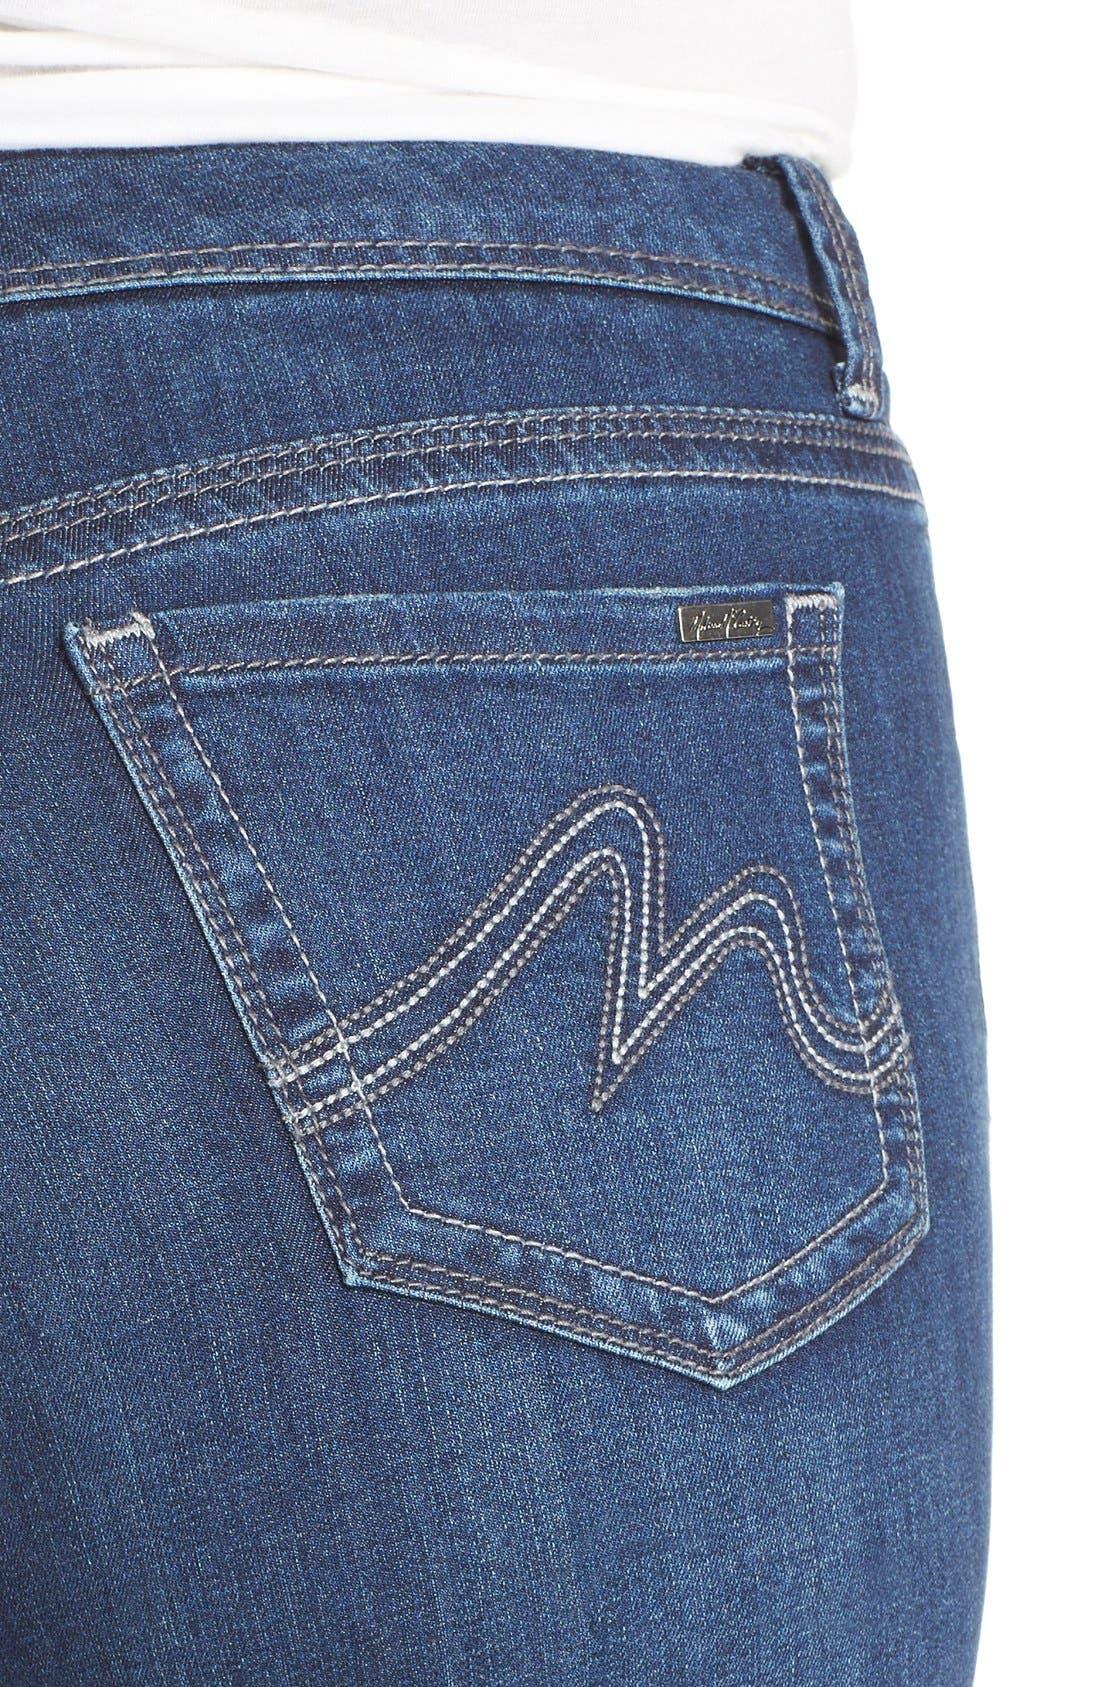 Stretch Crop Jeans,                             Alternate thumbnail 3, color,                             428